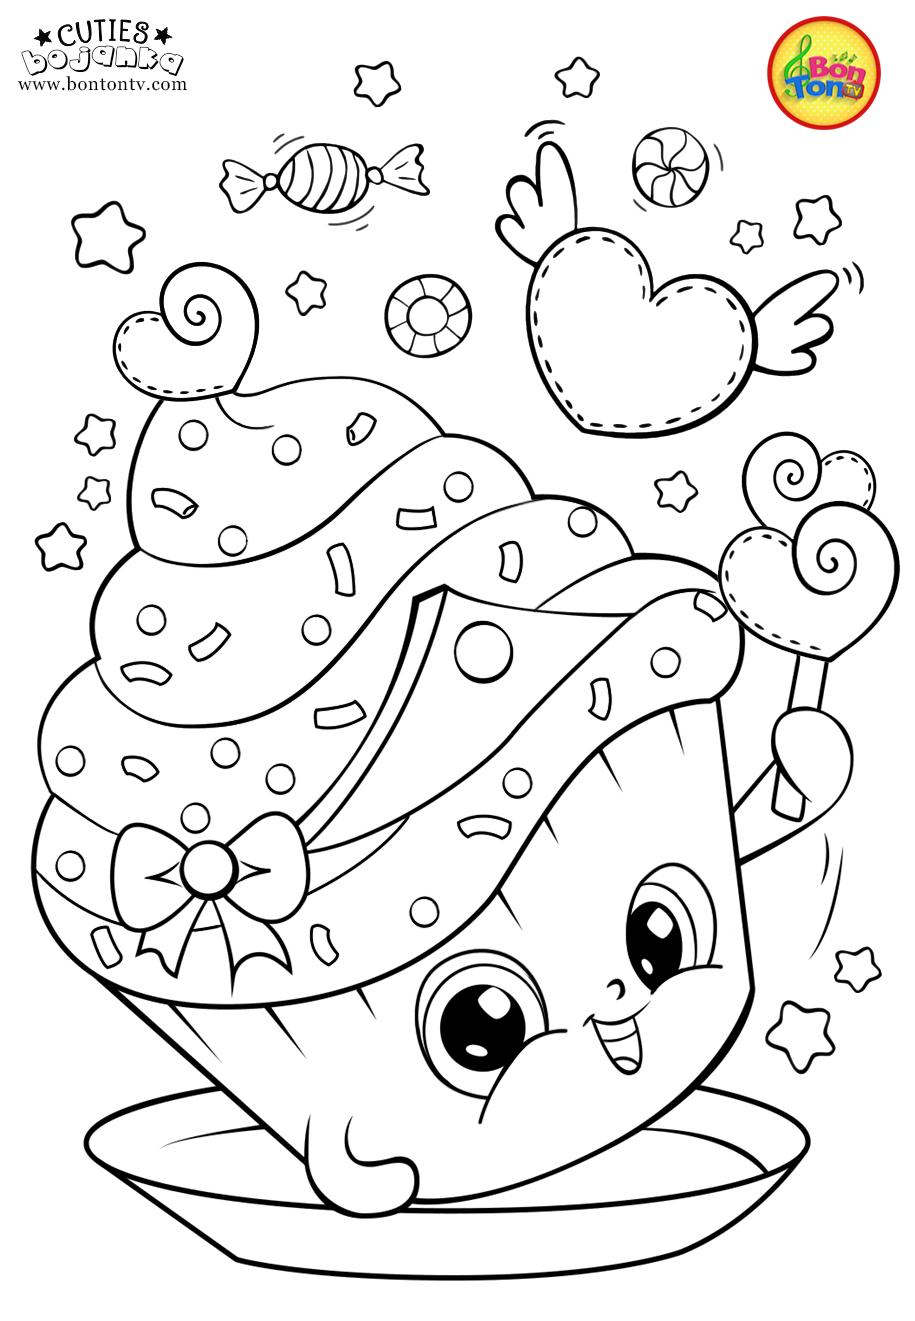 Cuties Coloring Pages For Kids Free Preschool Printables Slatkice Bojanke Cute Animal Free Kids Coloring Pages Spring Coloring Pages Cute Coloring Pages